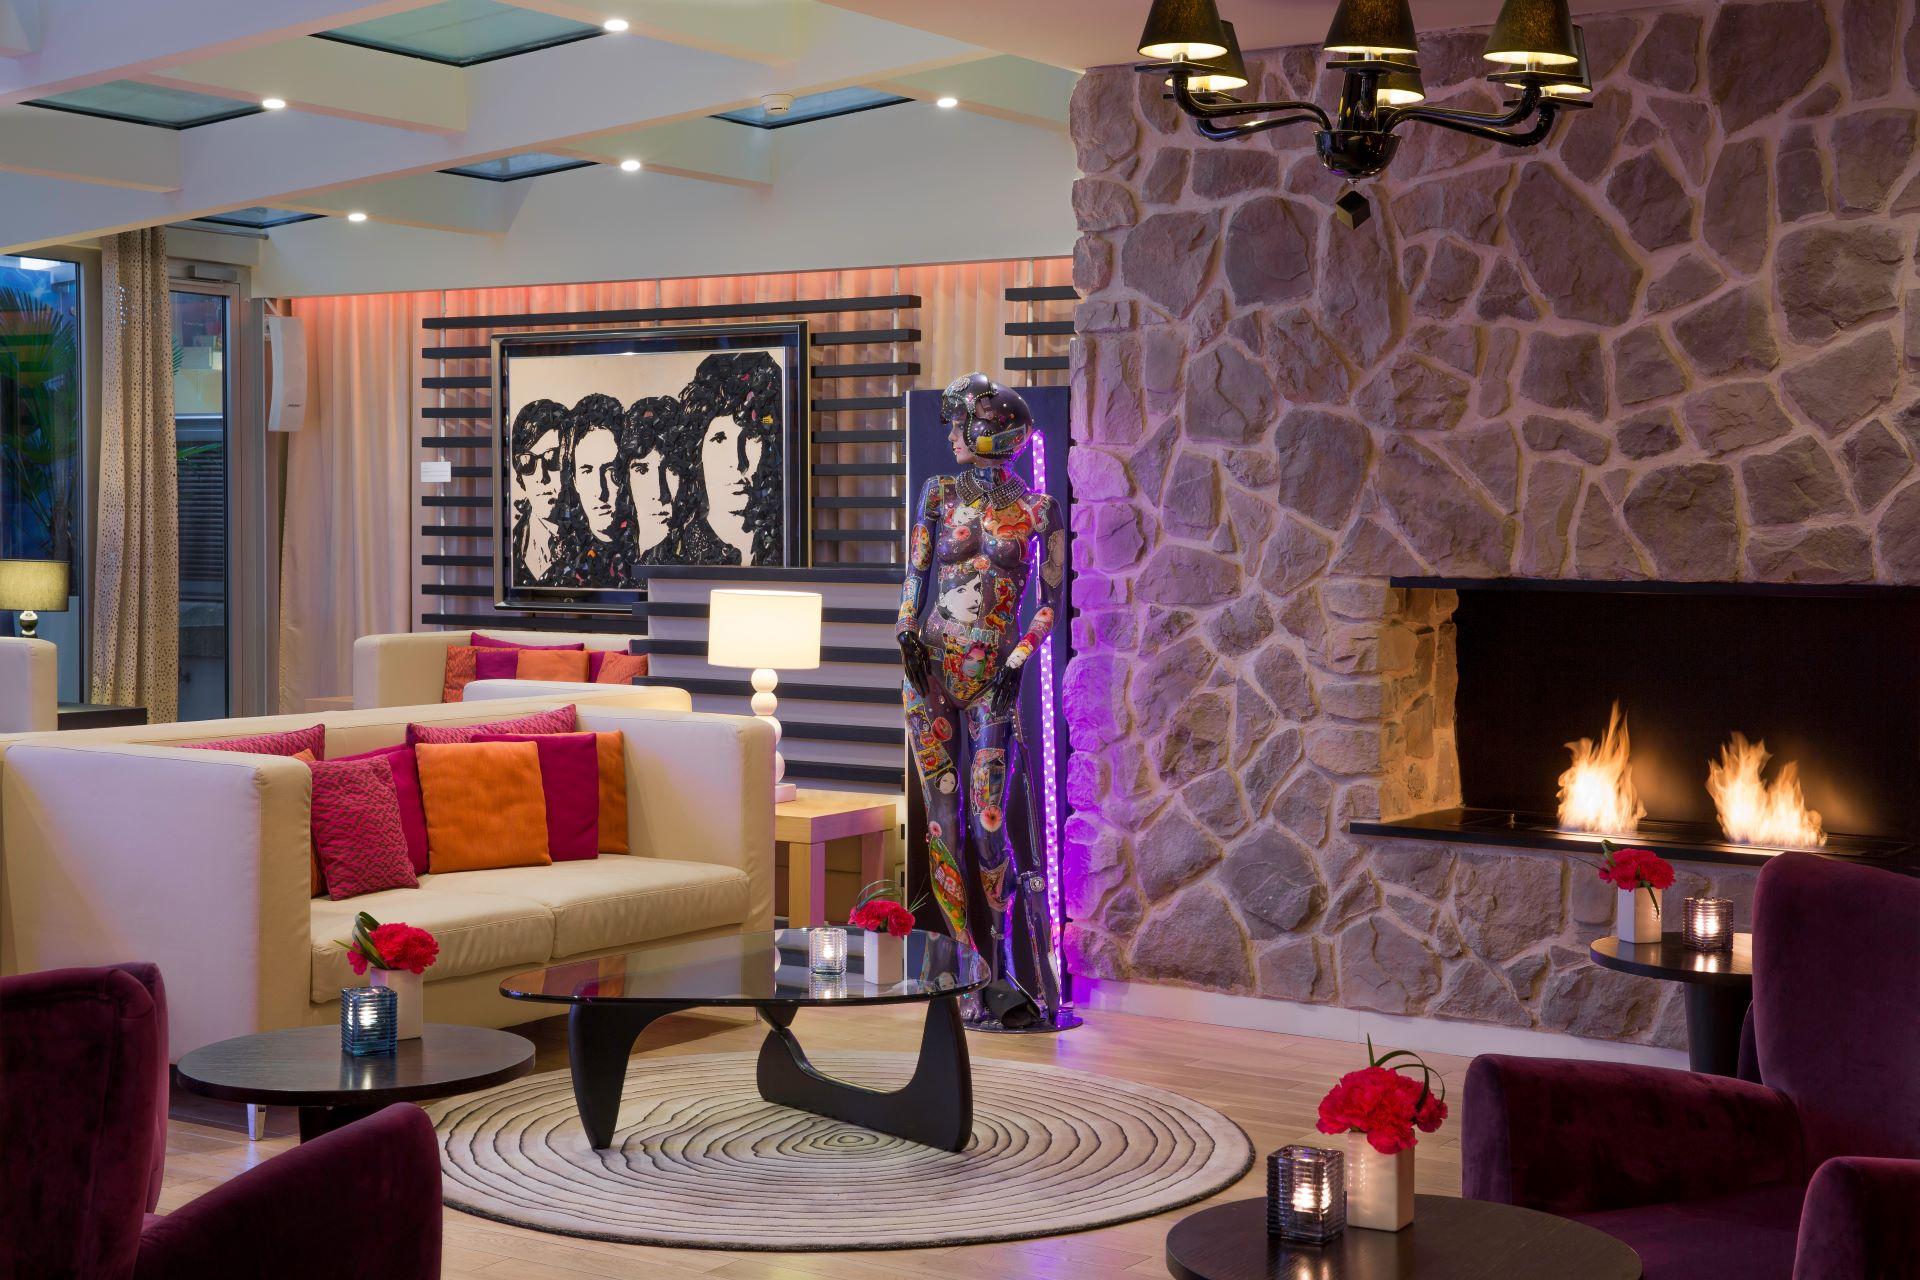 le-prestige-dun-hotel-4-etoiles-au-coeur-de-geneve